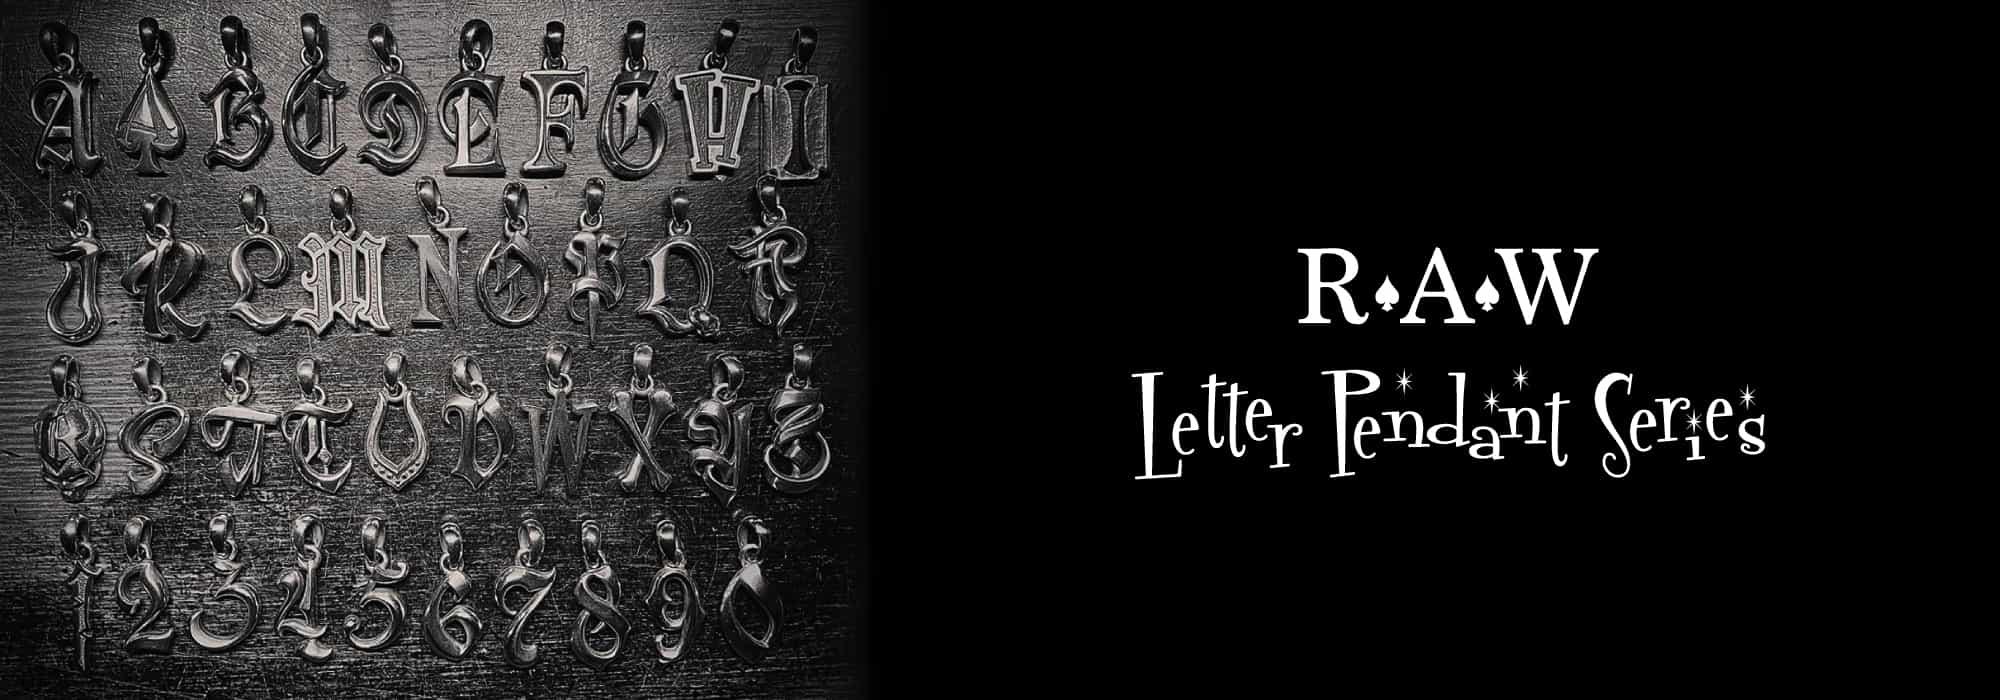 Letter Pendant Series